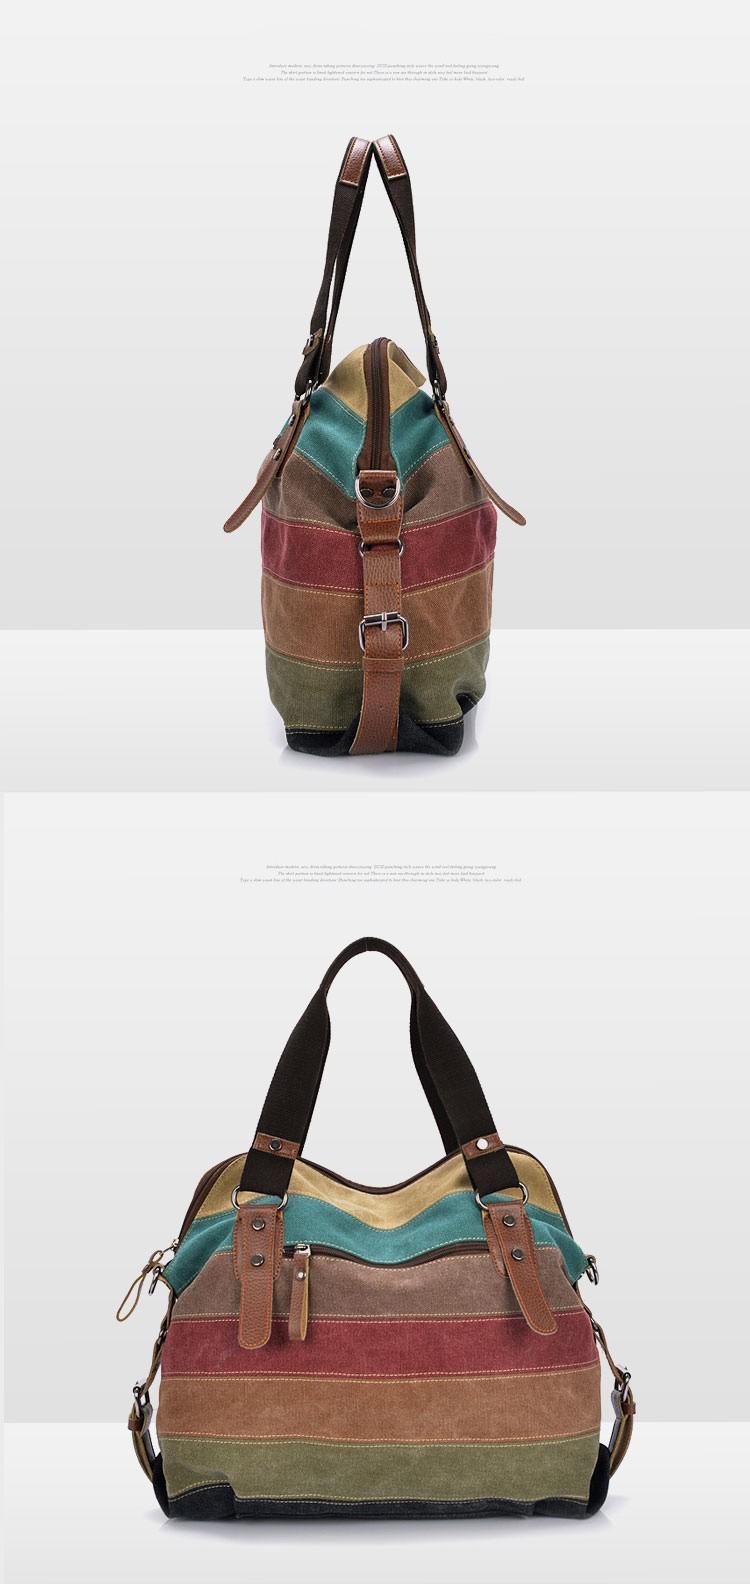 Phedera - Leather Rainbow Purse 10